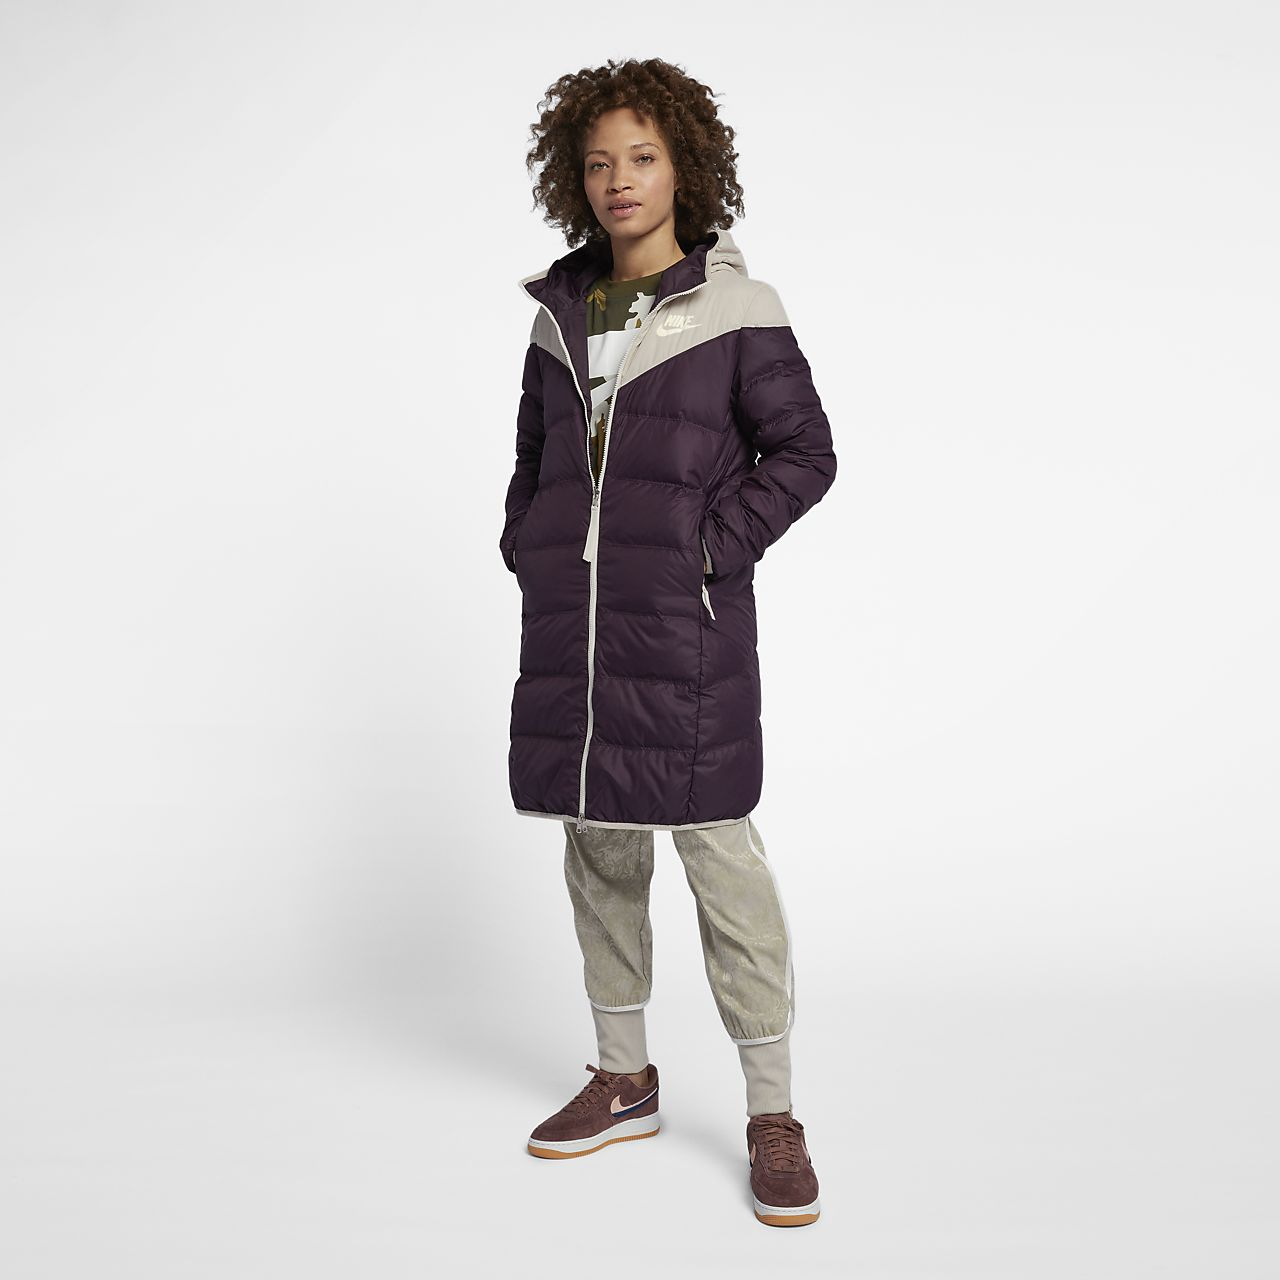 Nike Avec En Réversible Sportswear Duvet Veste Windrunner Garnissage AwXSxt5